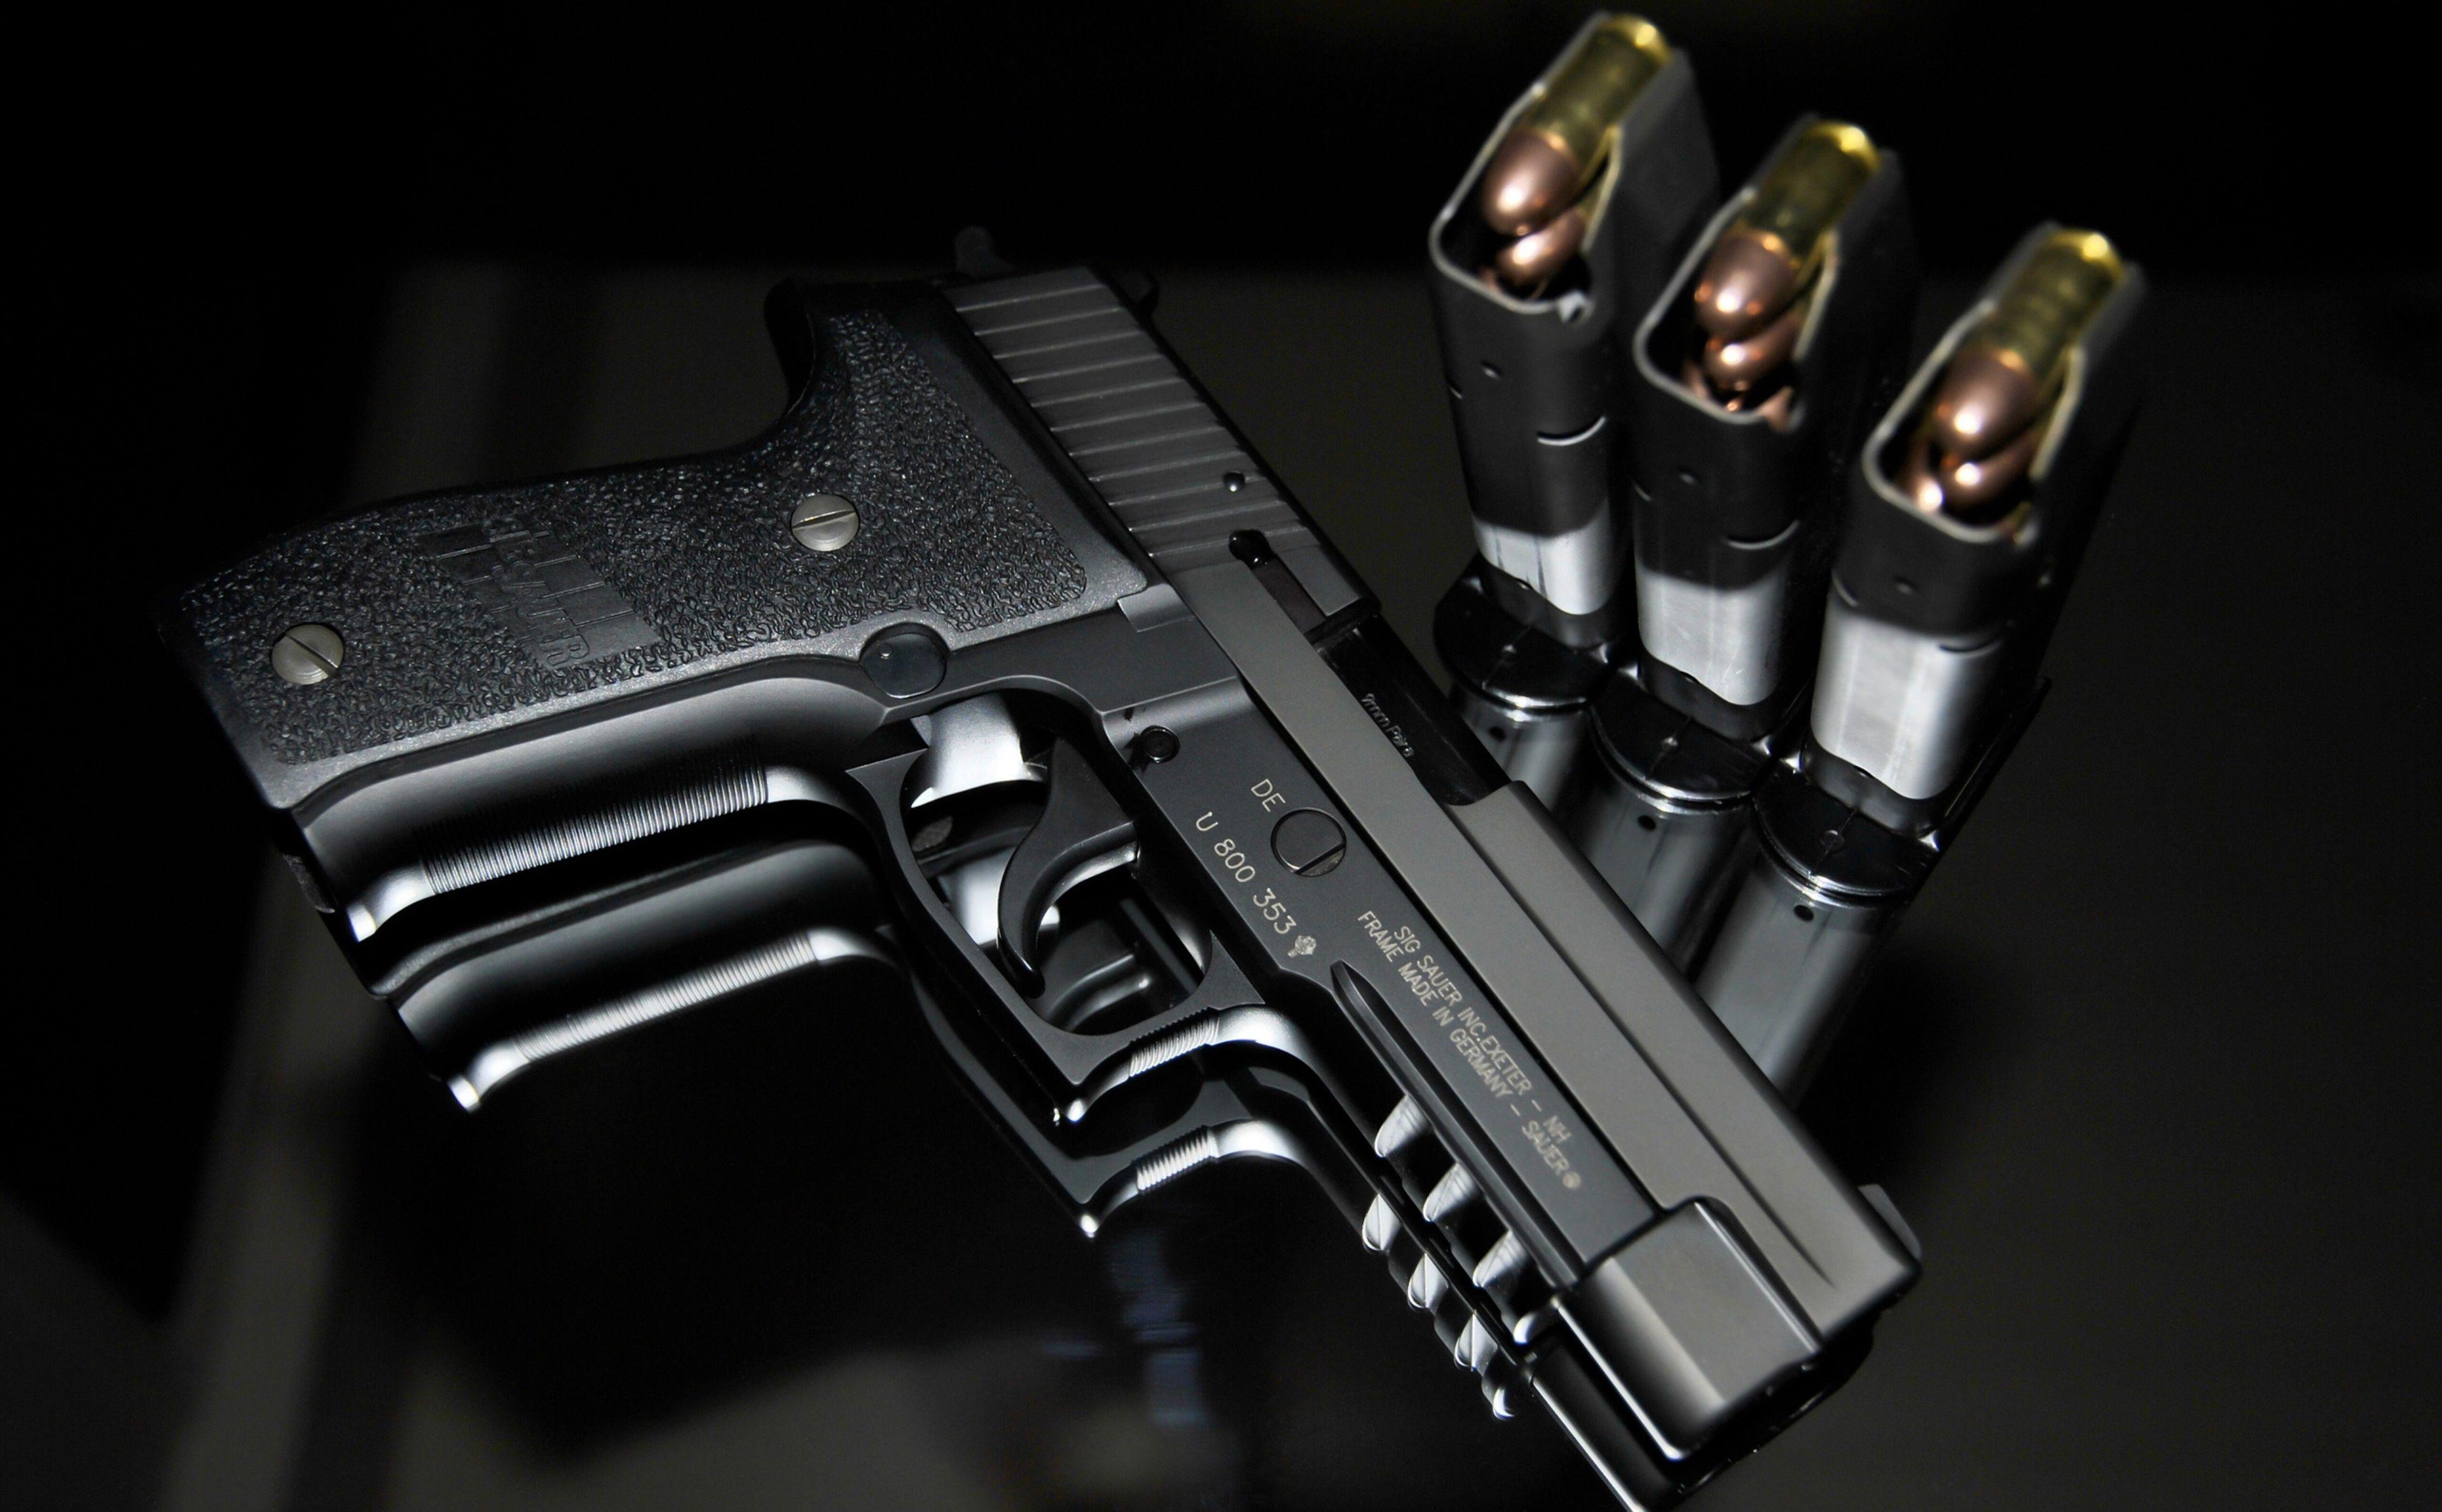 3840x2378 Sig Sauer P226 4k Wallpaper Picture Weapons Hand Guns